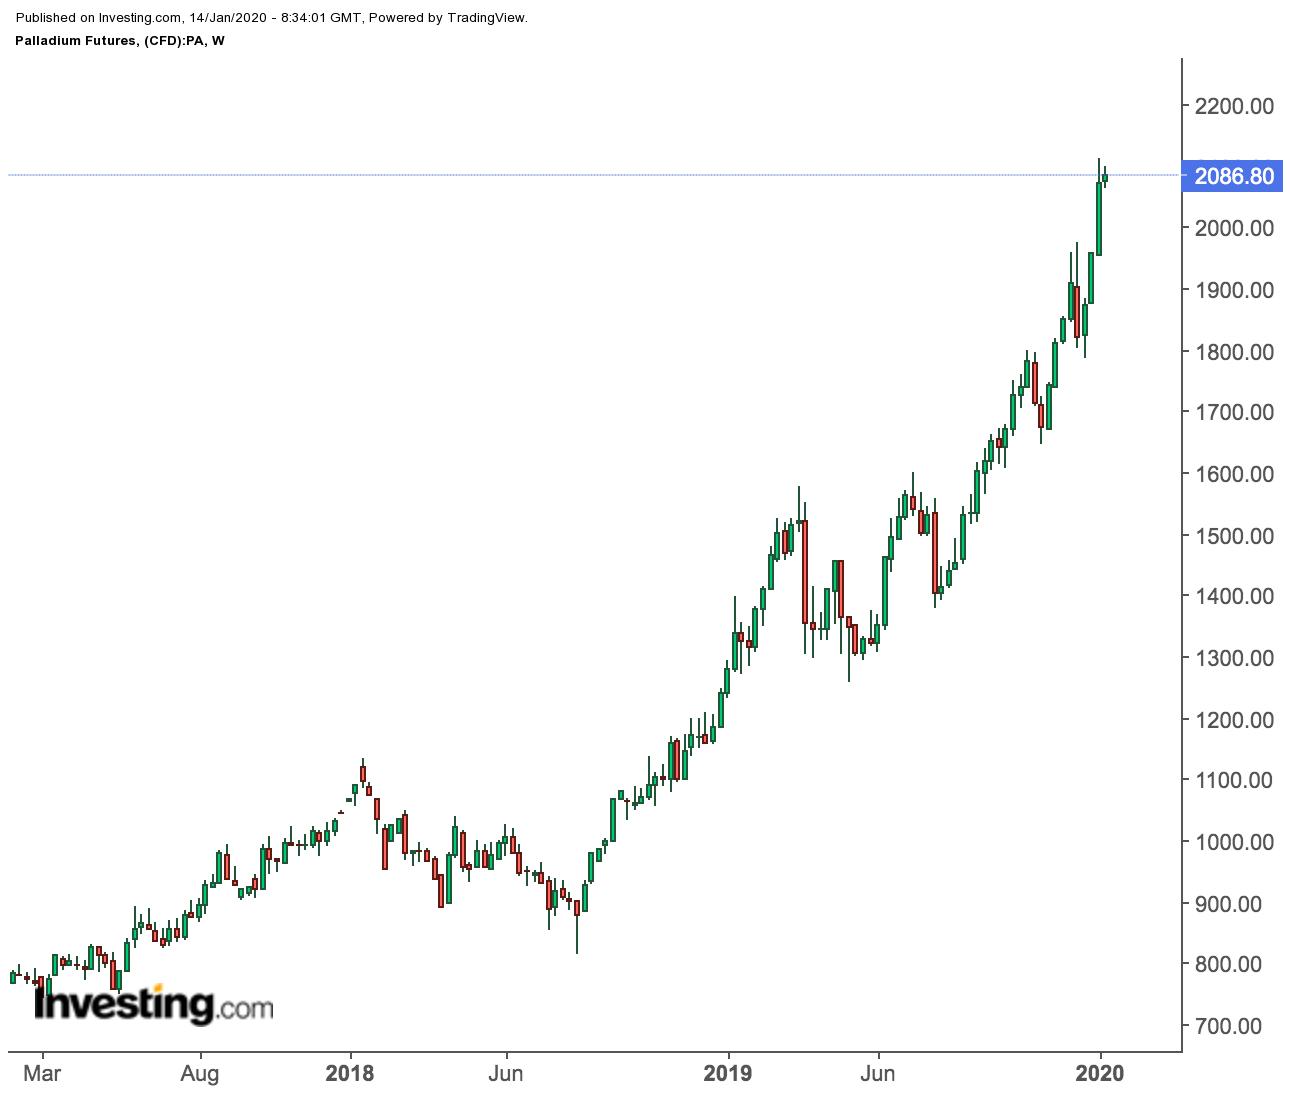 Palladium Futures Weekly Prices Chart